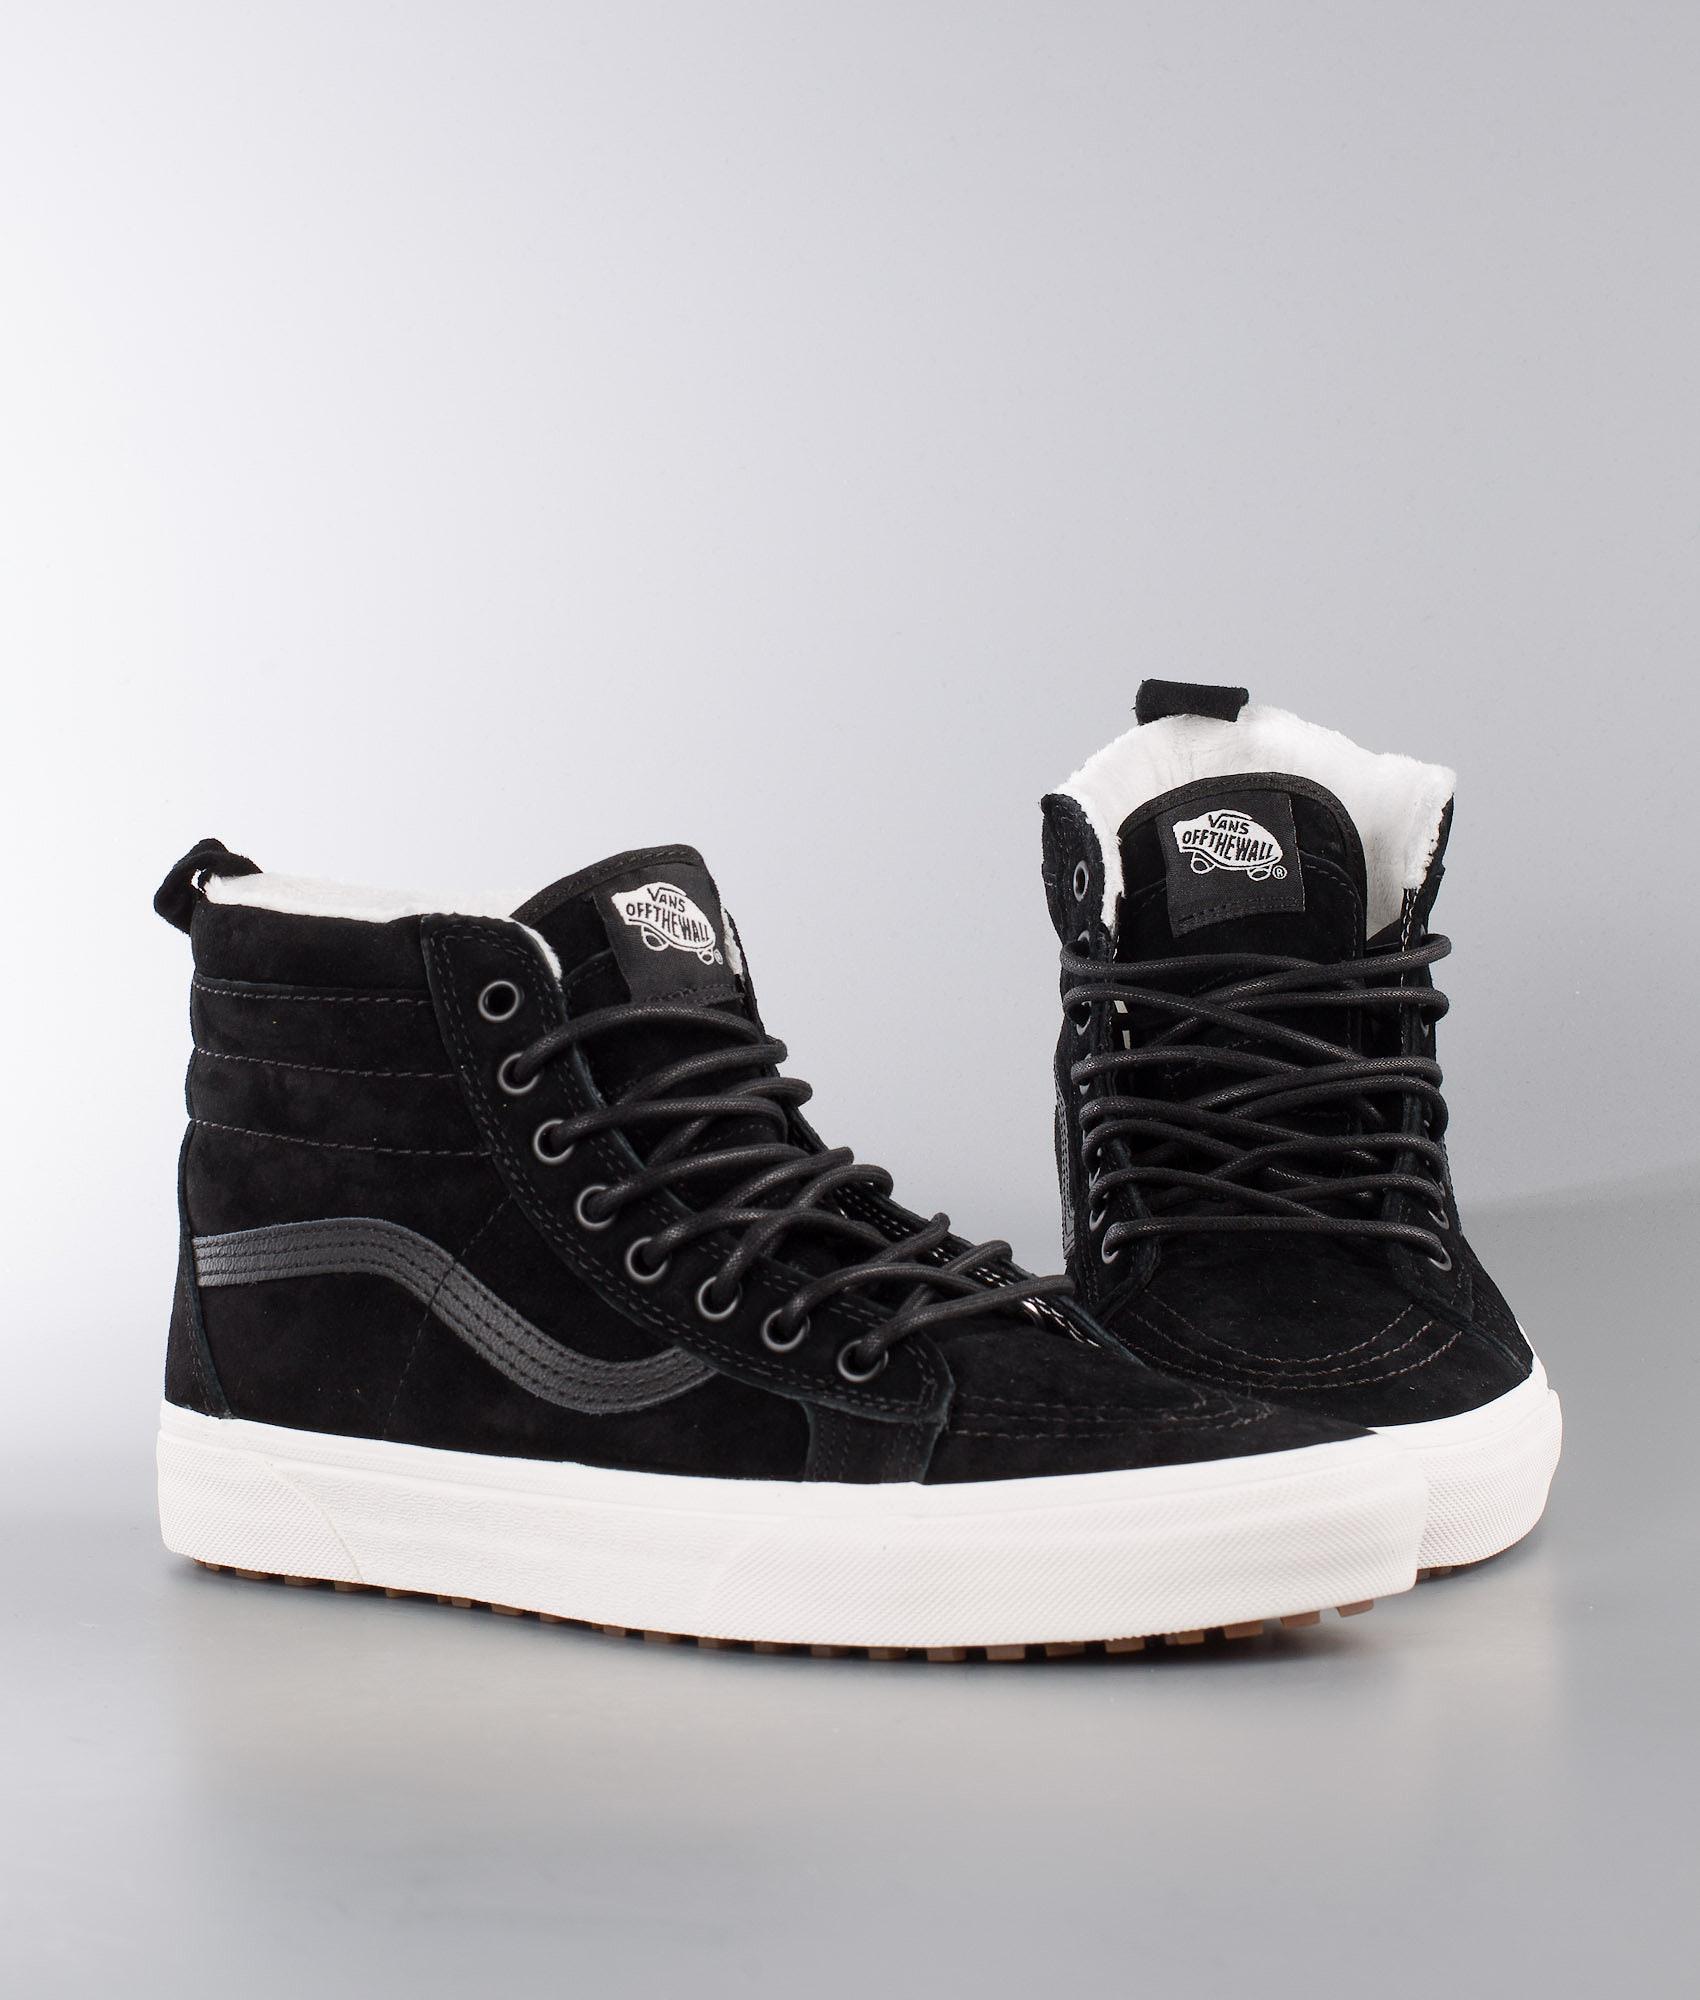 7838bee959e Vans Sk8-Hi Mte Shoes (Mte) Black Black Marshmallow - Ridestore.com